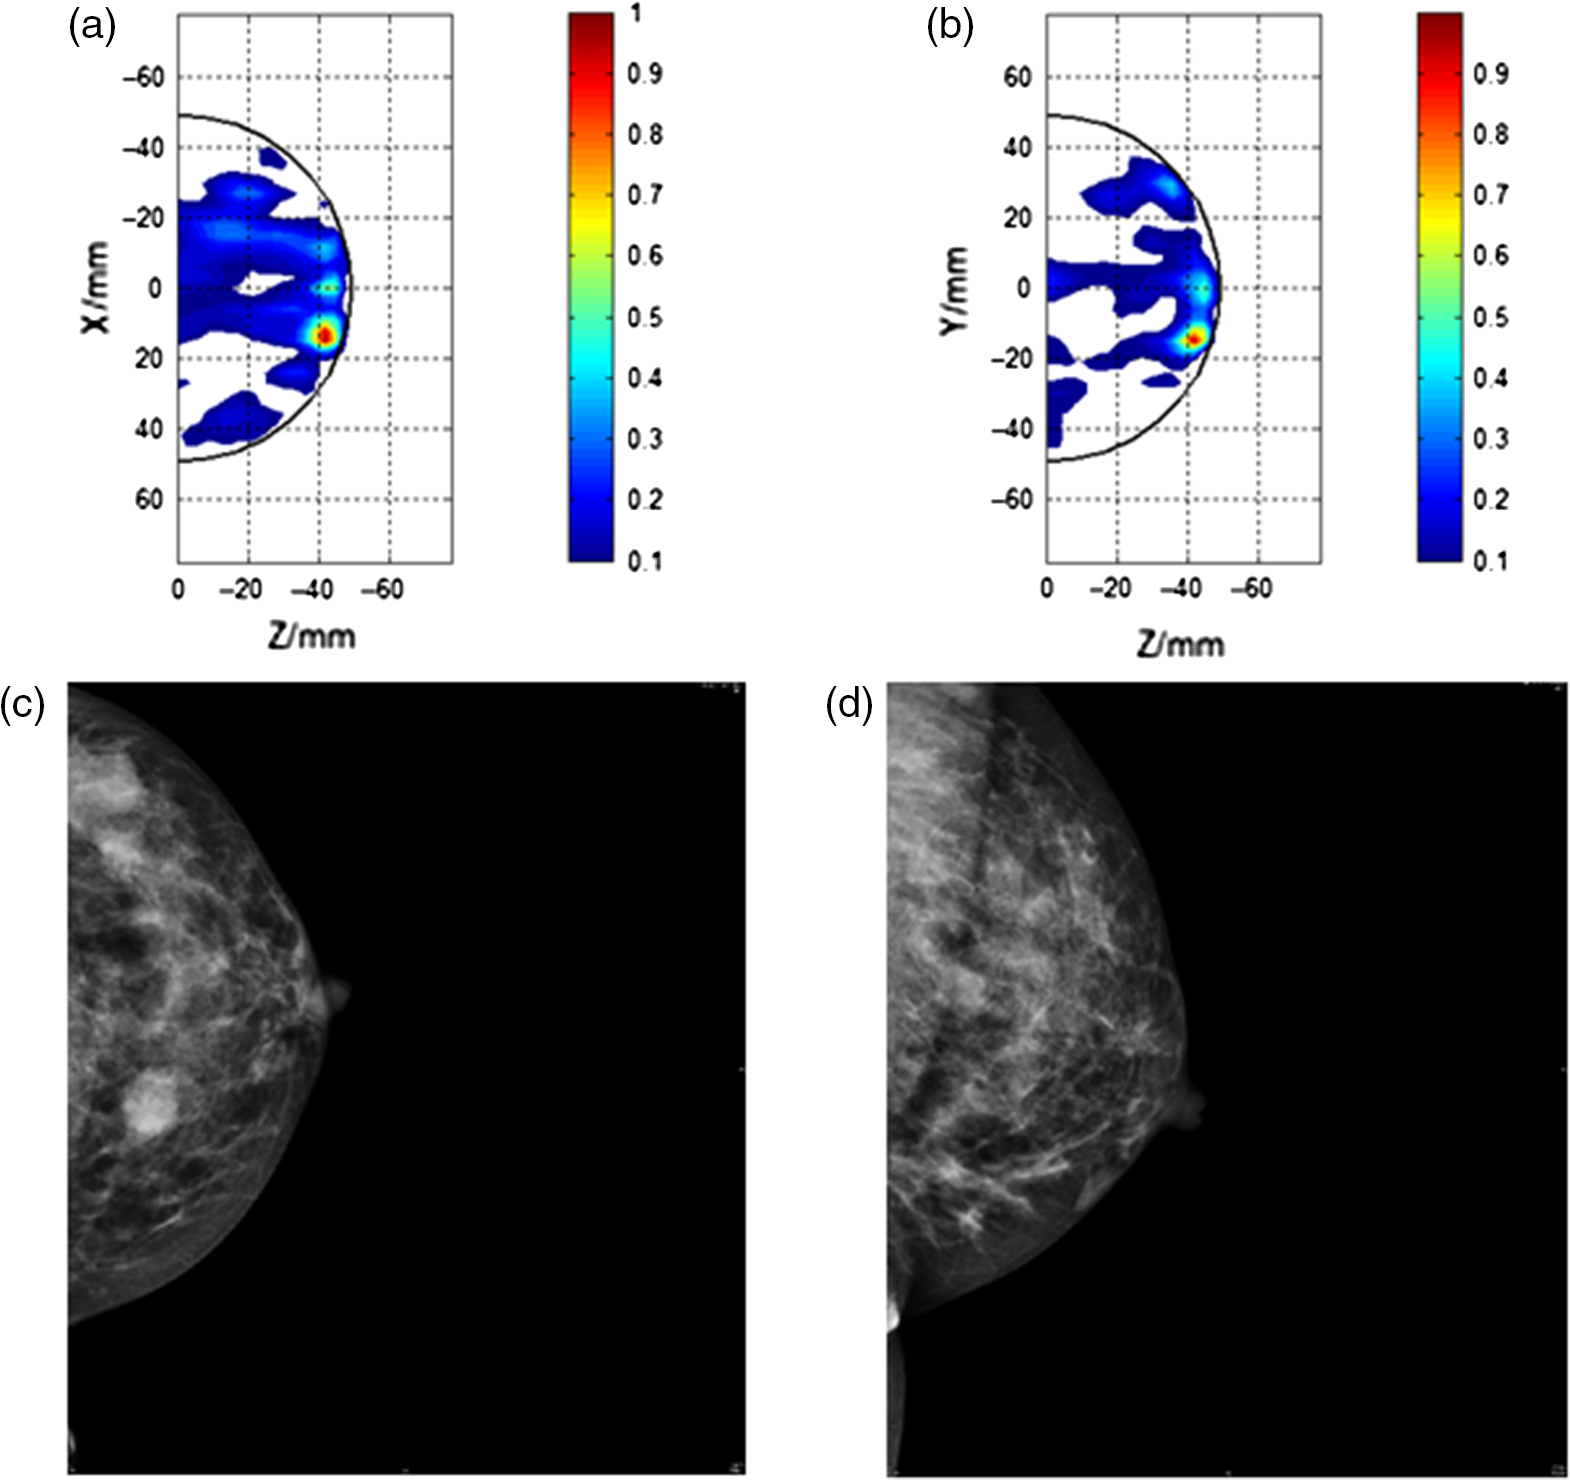 Maria m4 clinical evaluation of a prototype ultrawideband radar jmi33033502f004g sciox Choice Image